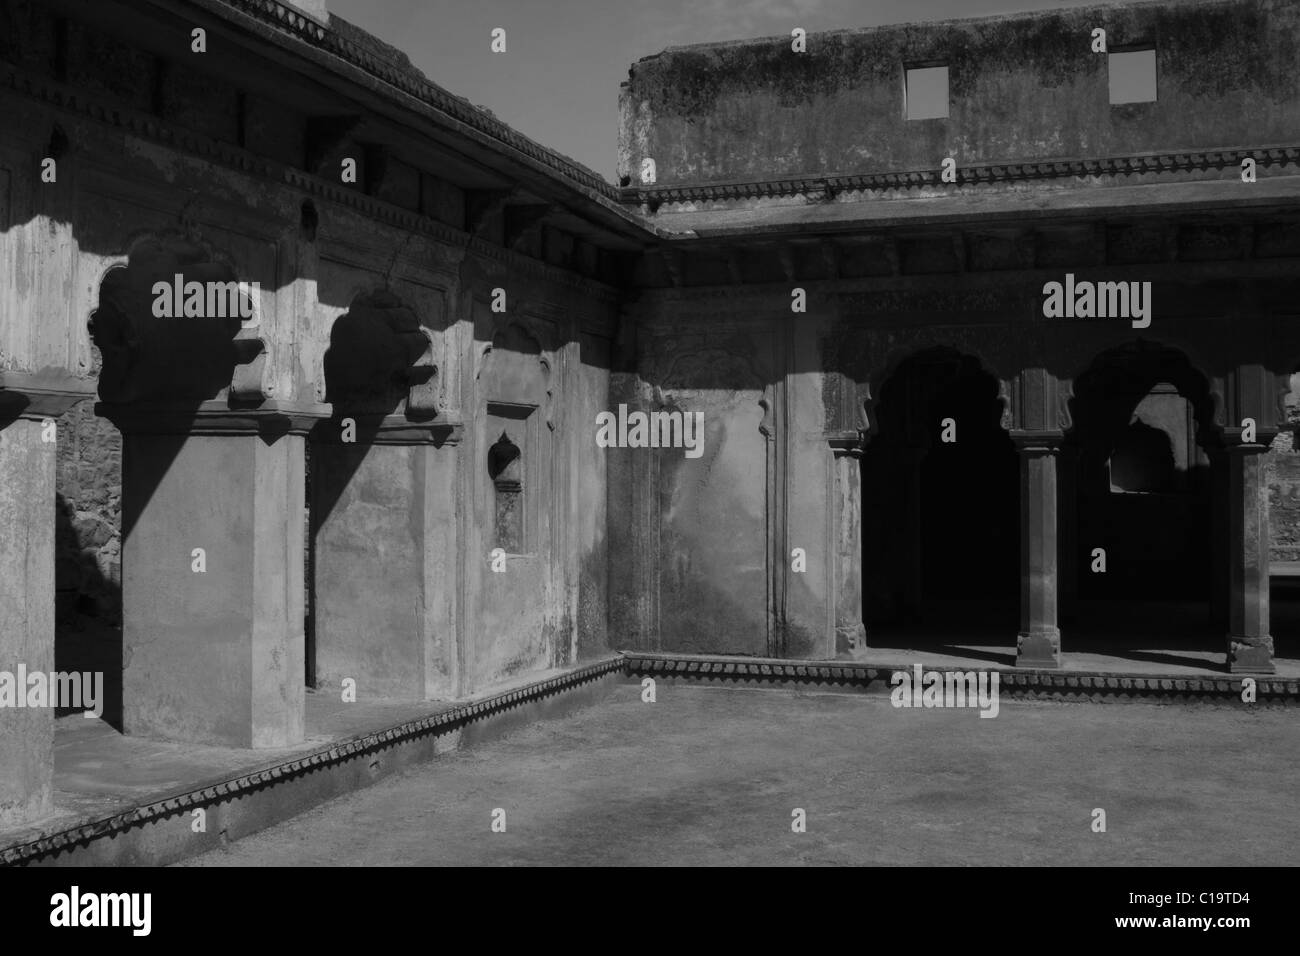 Arcade in a fort, Orchha Fort, Orchha, Madhya Pradesh, India - Stock Image